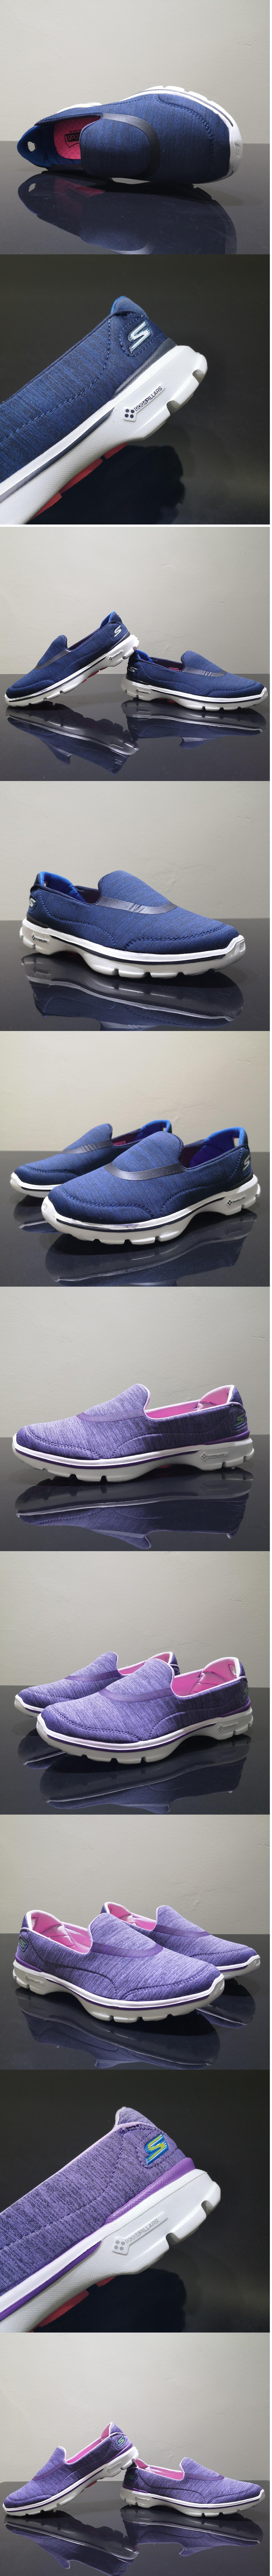 skechers斯凱奇2021新款女鞋一脚套懶人鞋健步鞋超輕時尚休閒運動鞋13980尺寸35-39